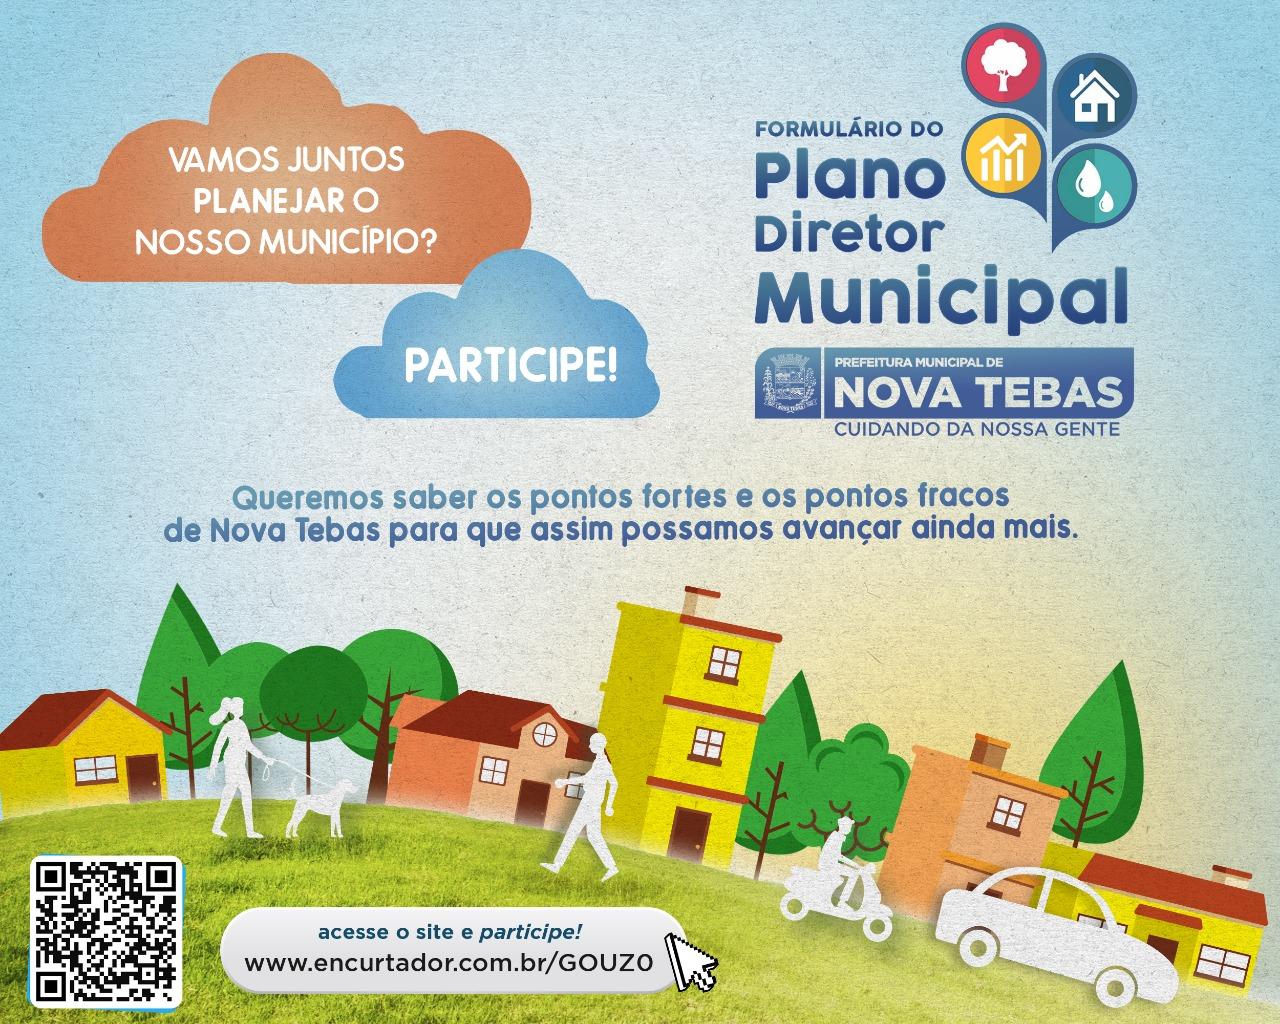 Plano Diretor Municipal - PARTICIPE